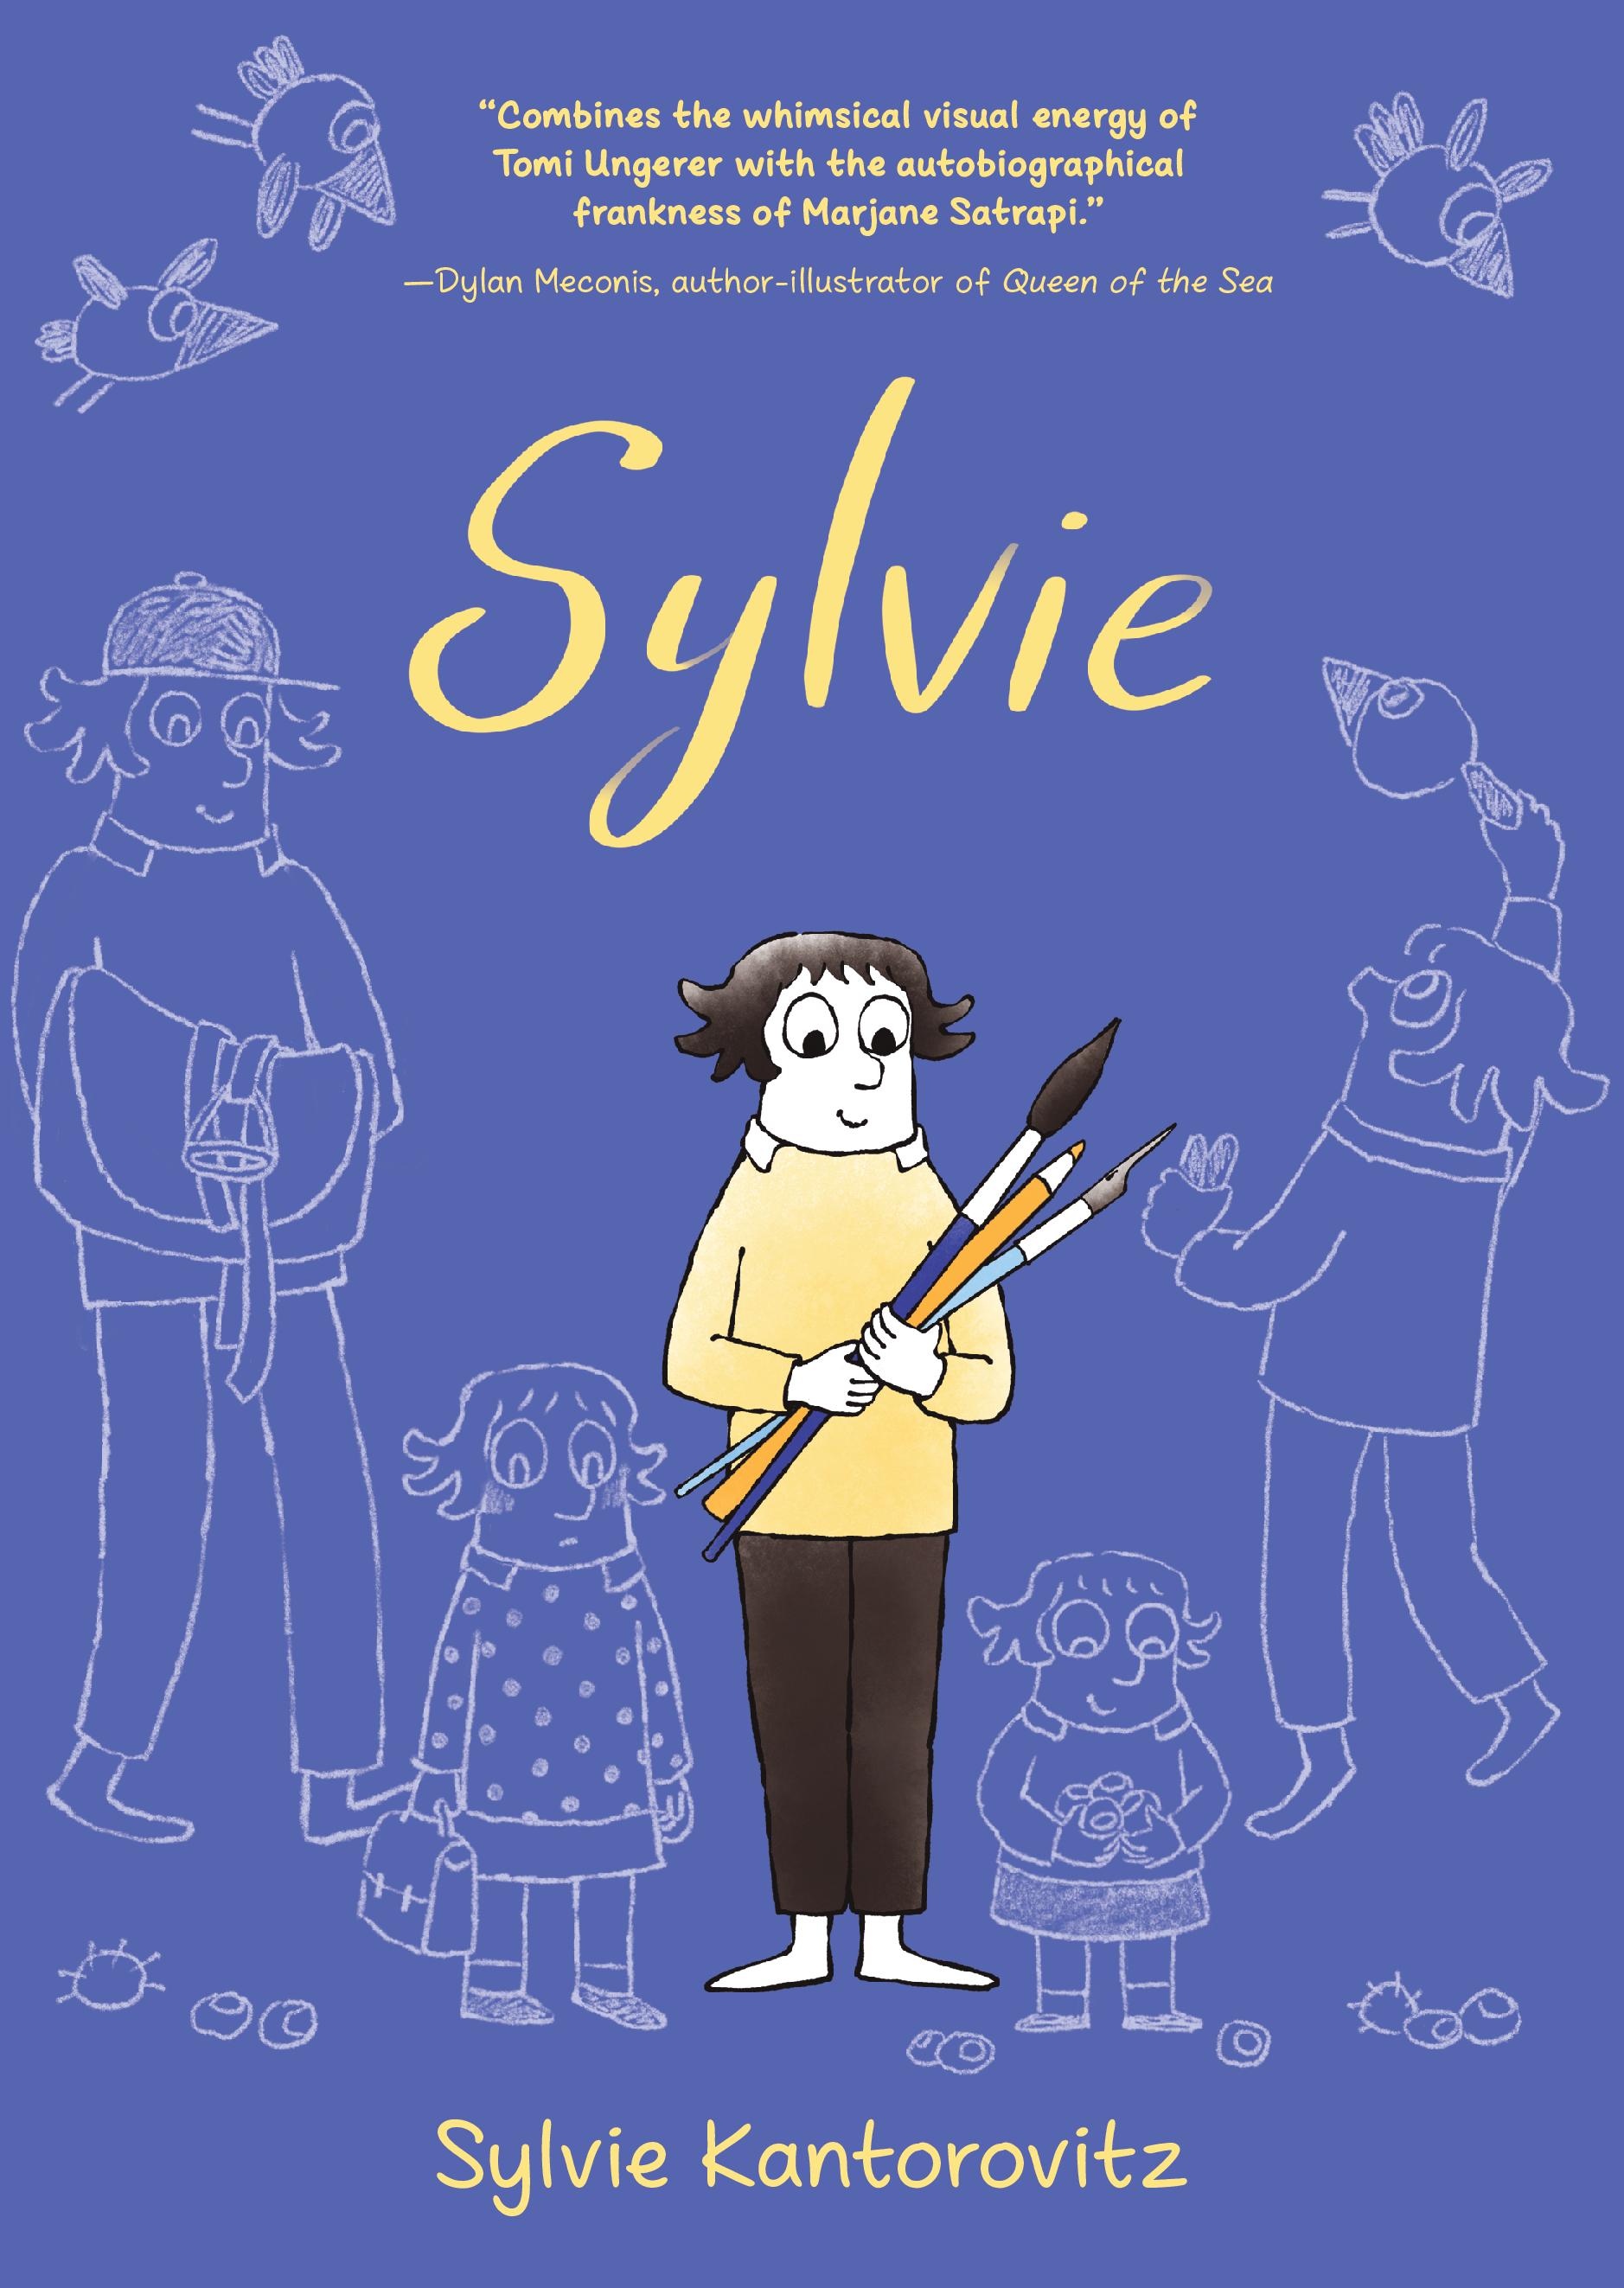 Sylvie by Sylvie Kantorovitz